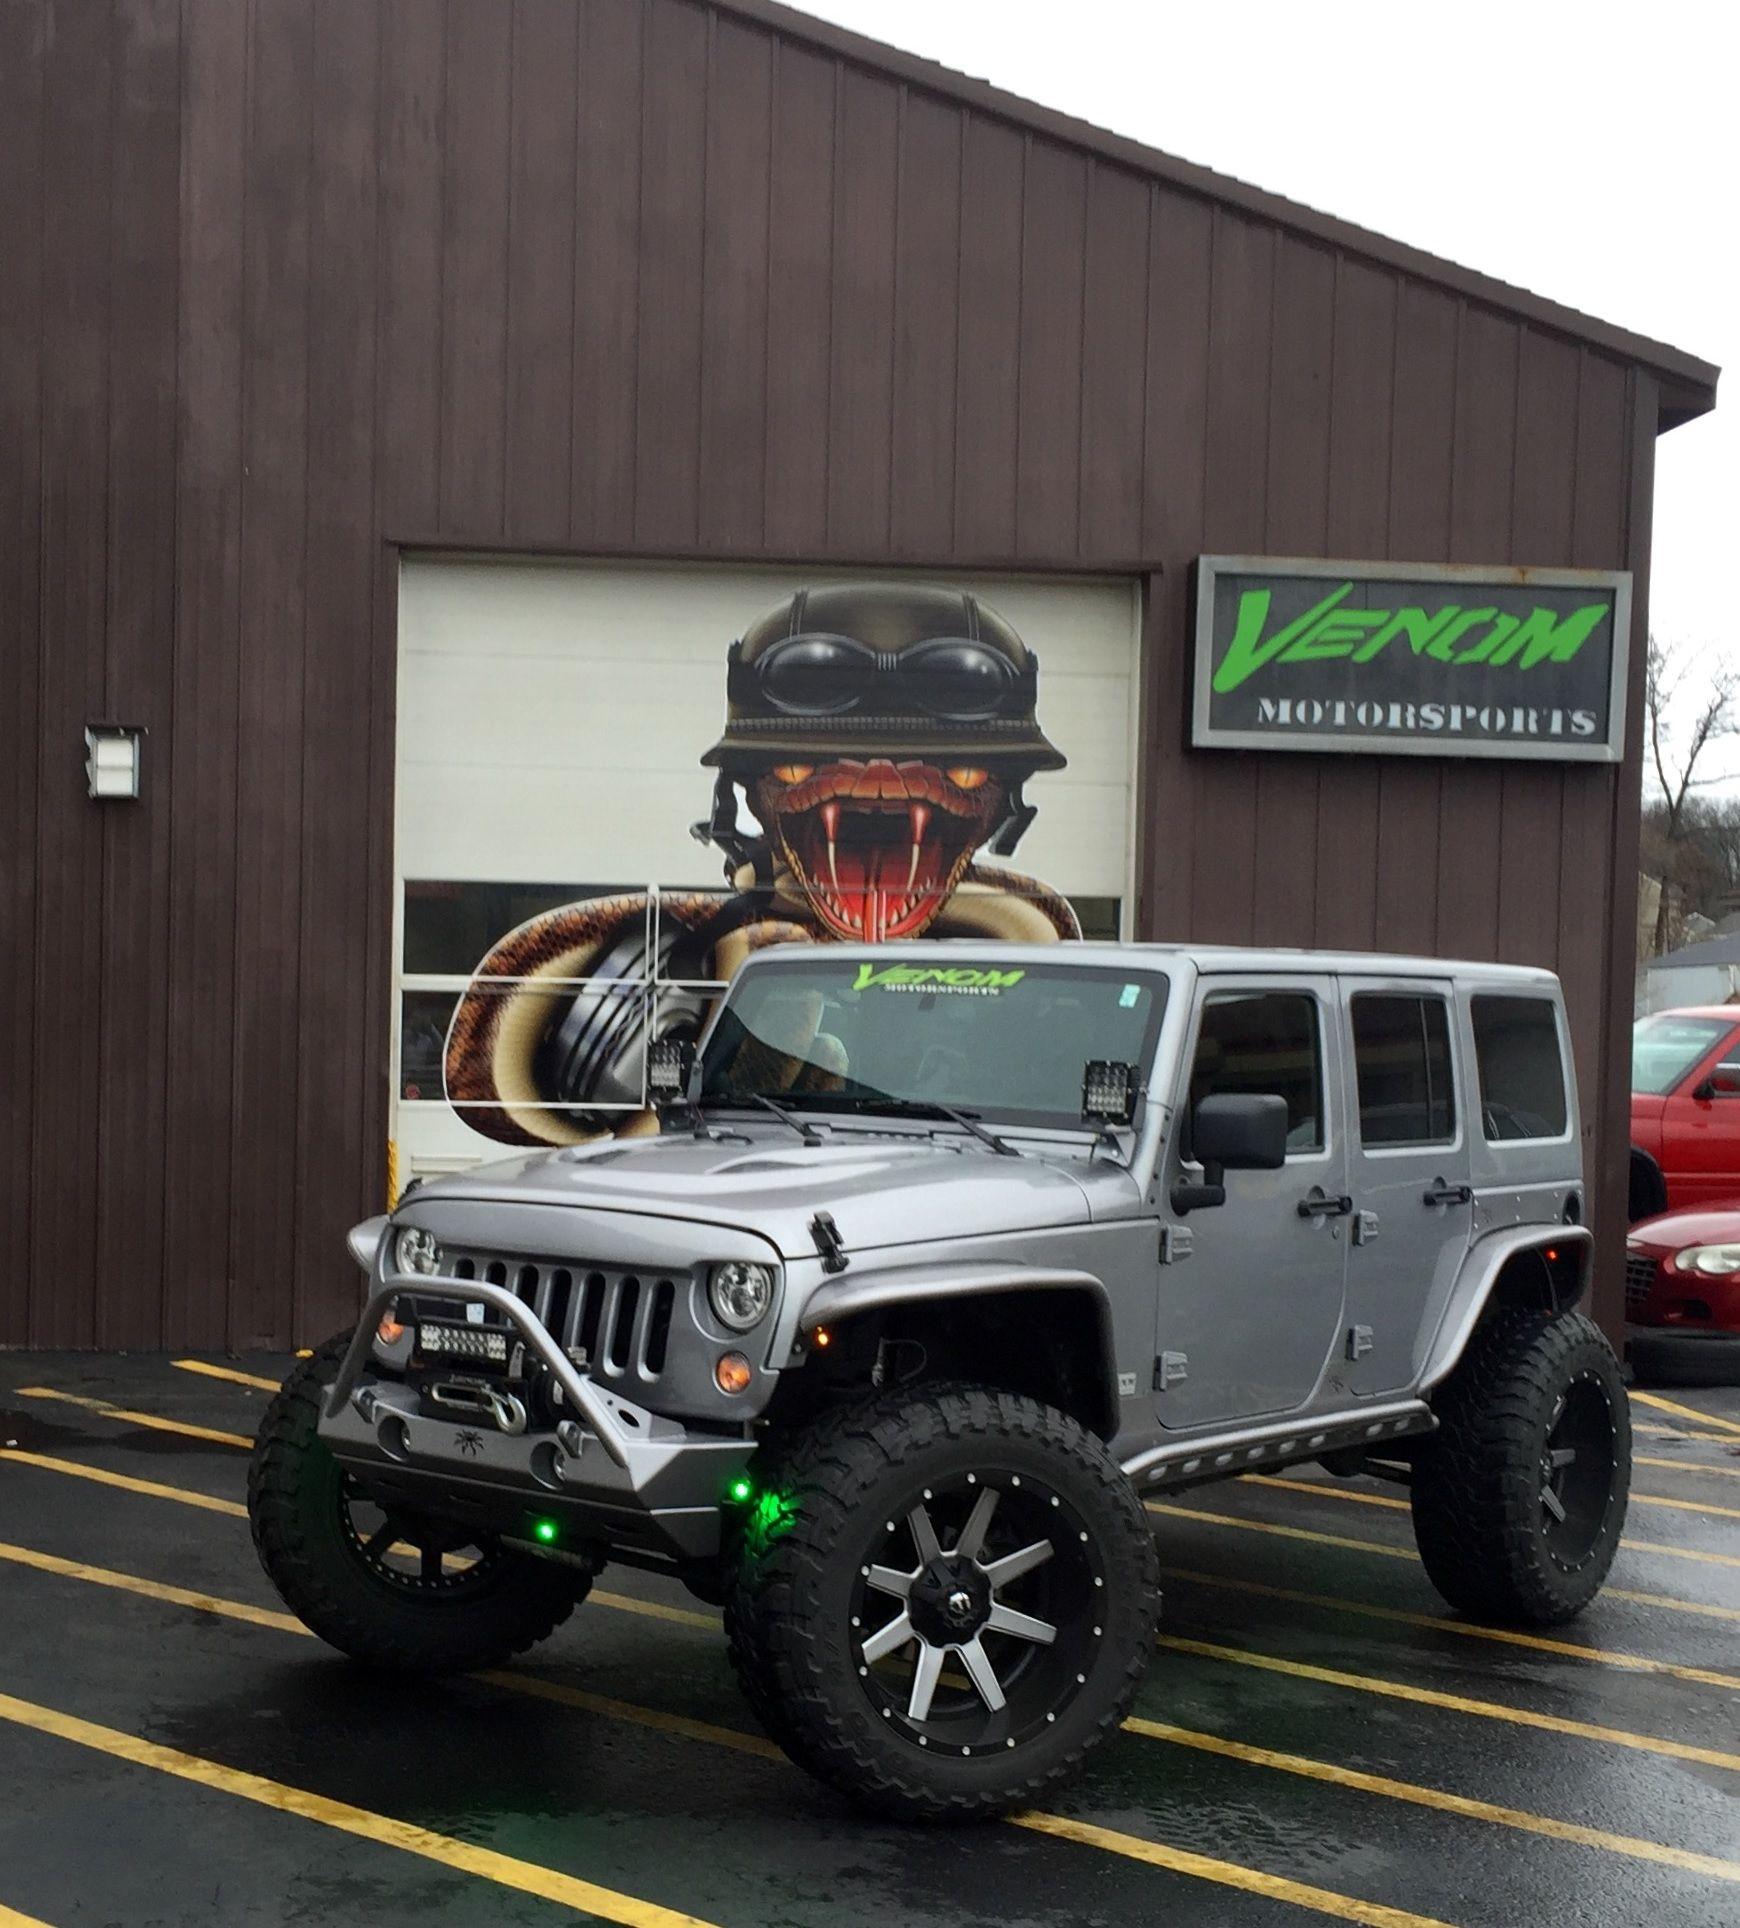 Custom Jeep Wrangler By Venom Motorsports Grand Rapids Michigan